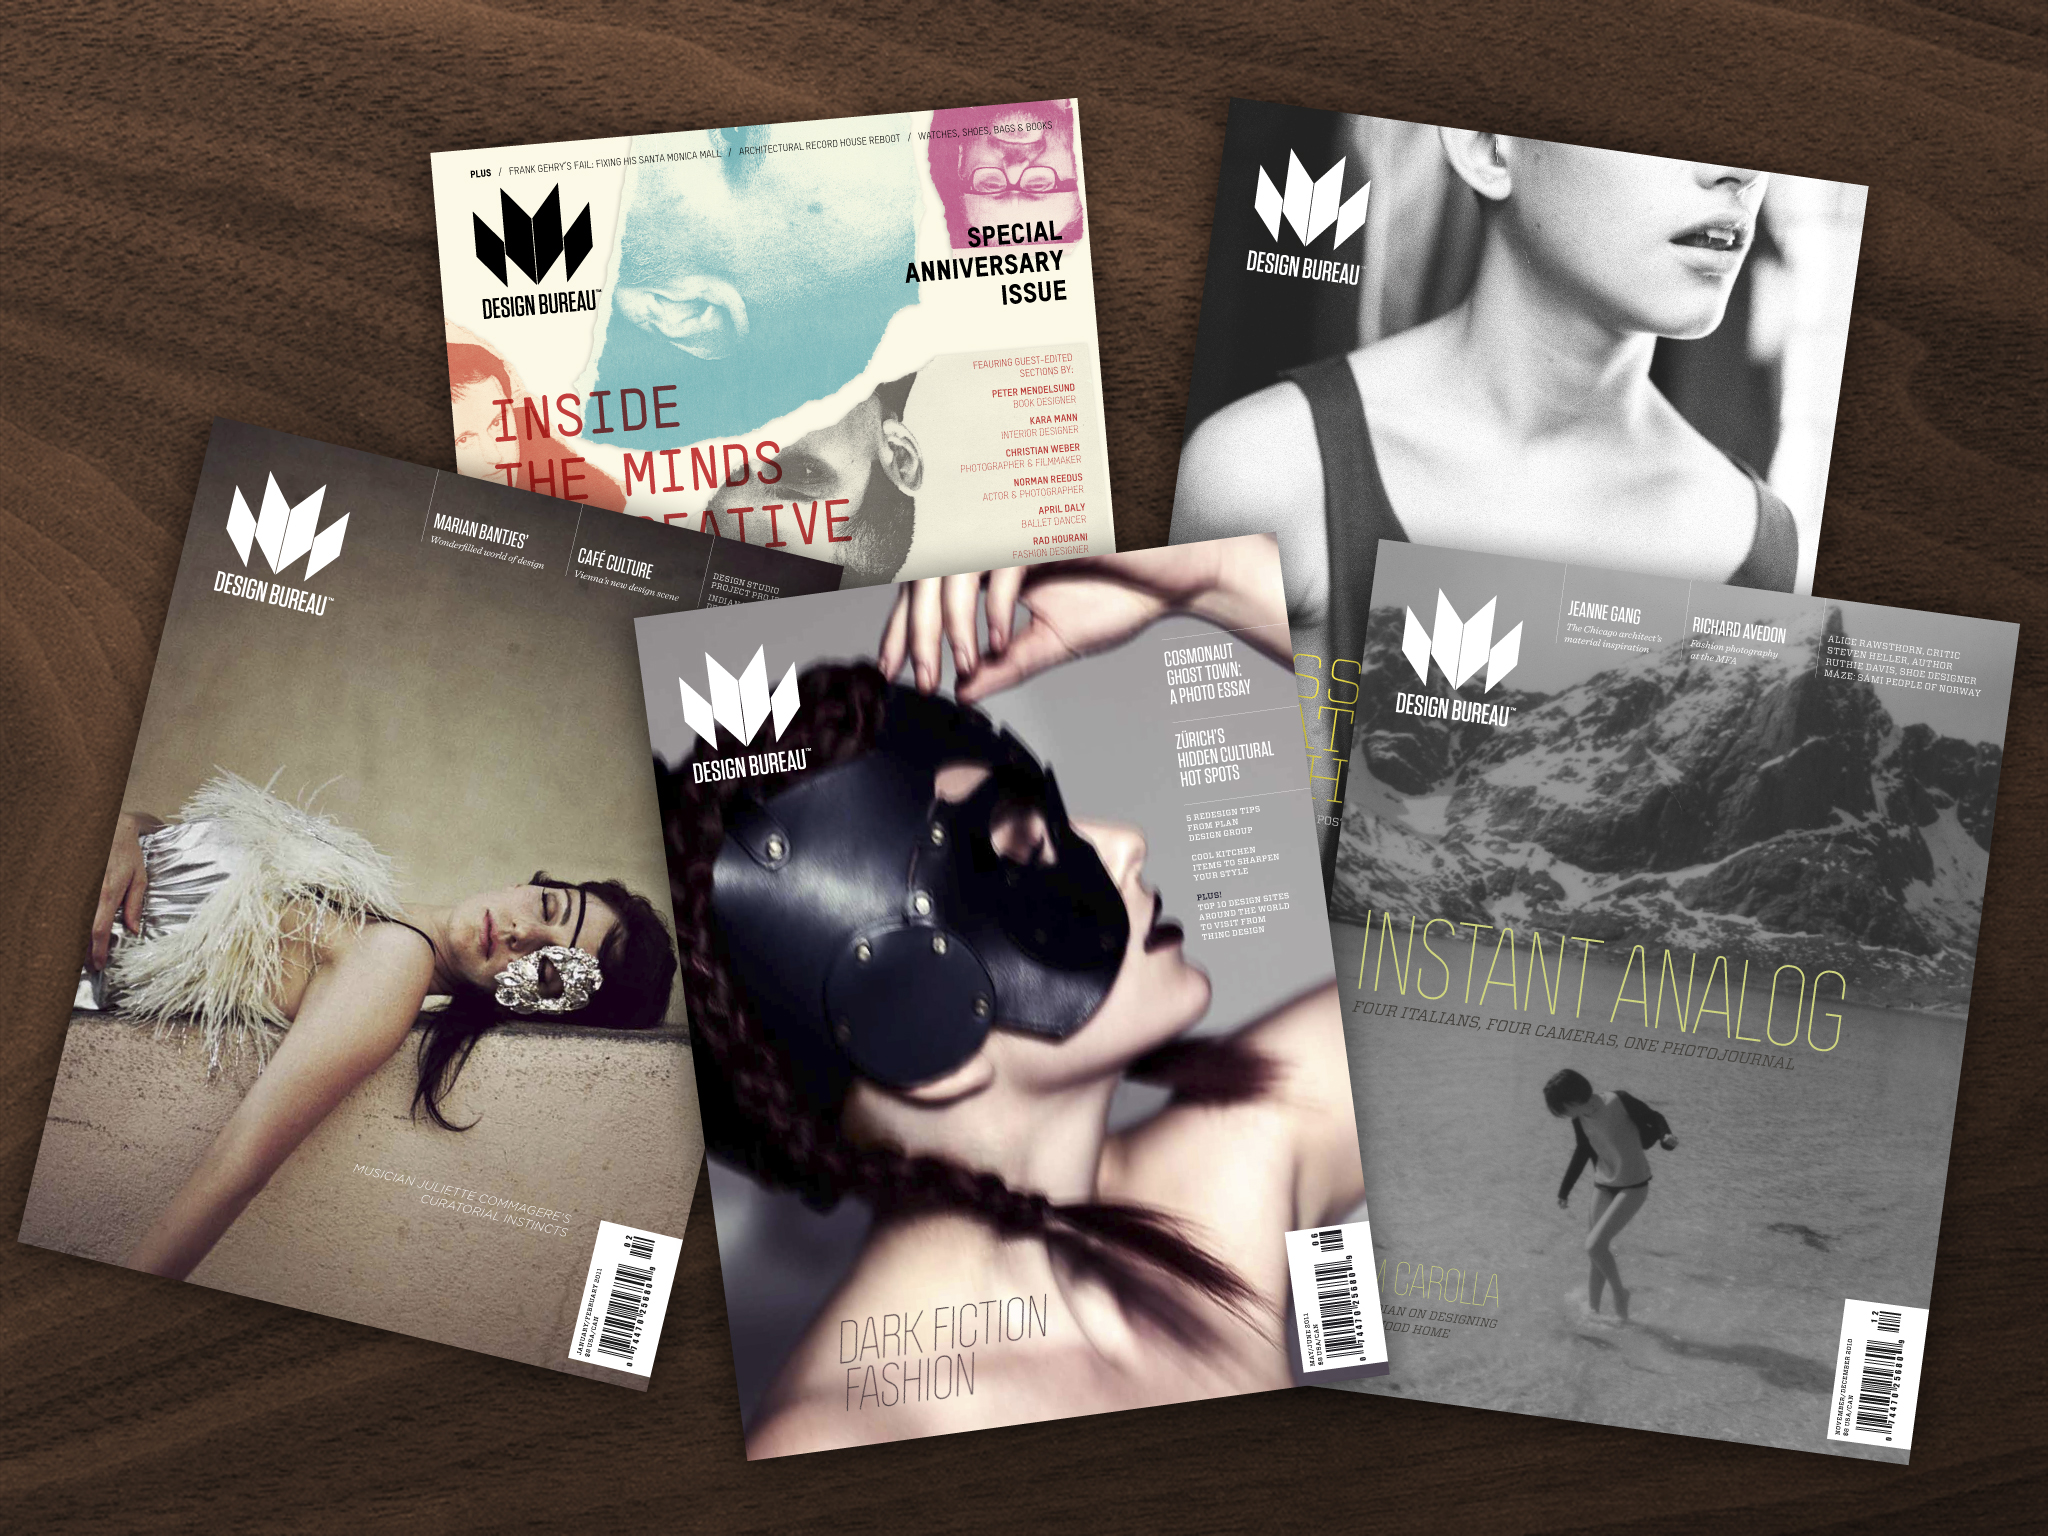 Design Bureau Magazine